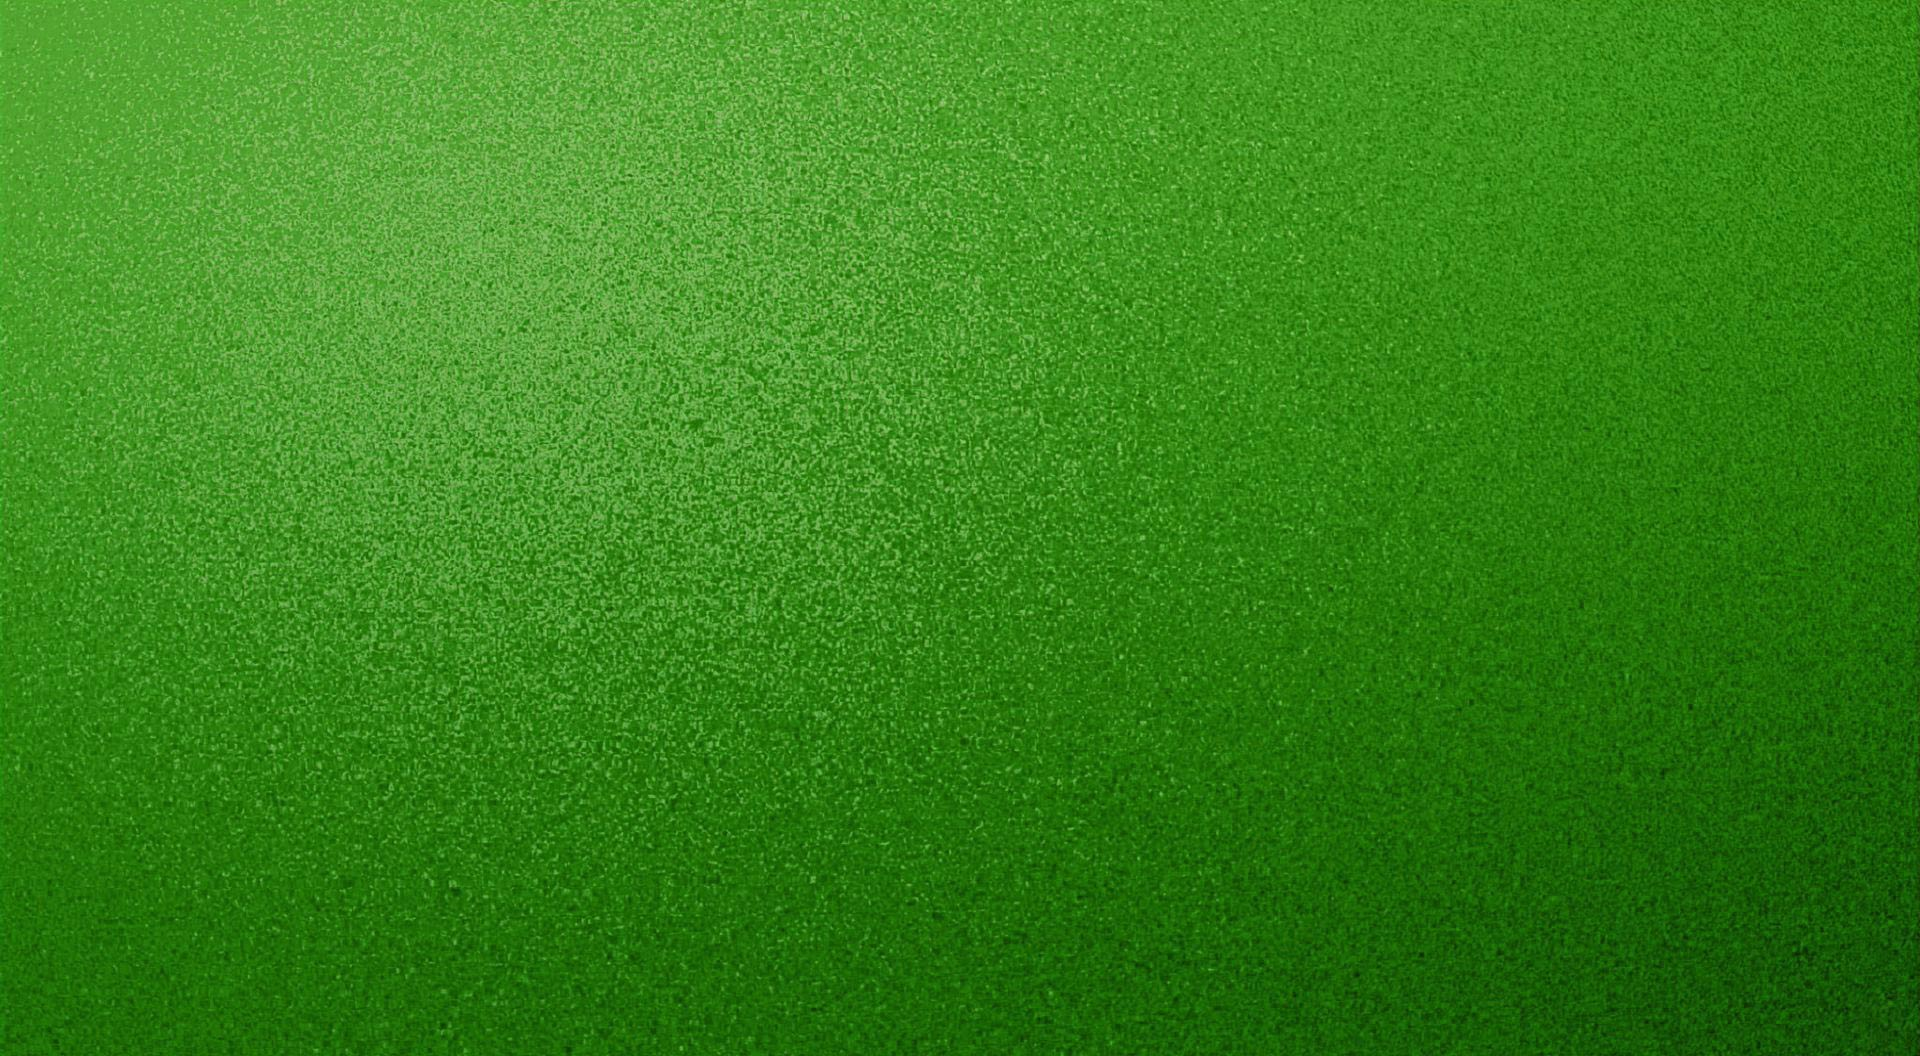 Green Background Images - WallpaperSafari